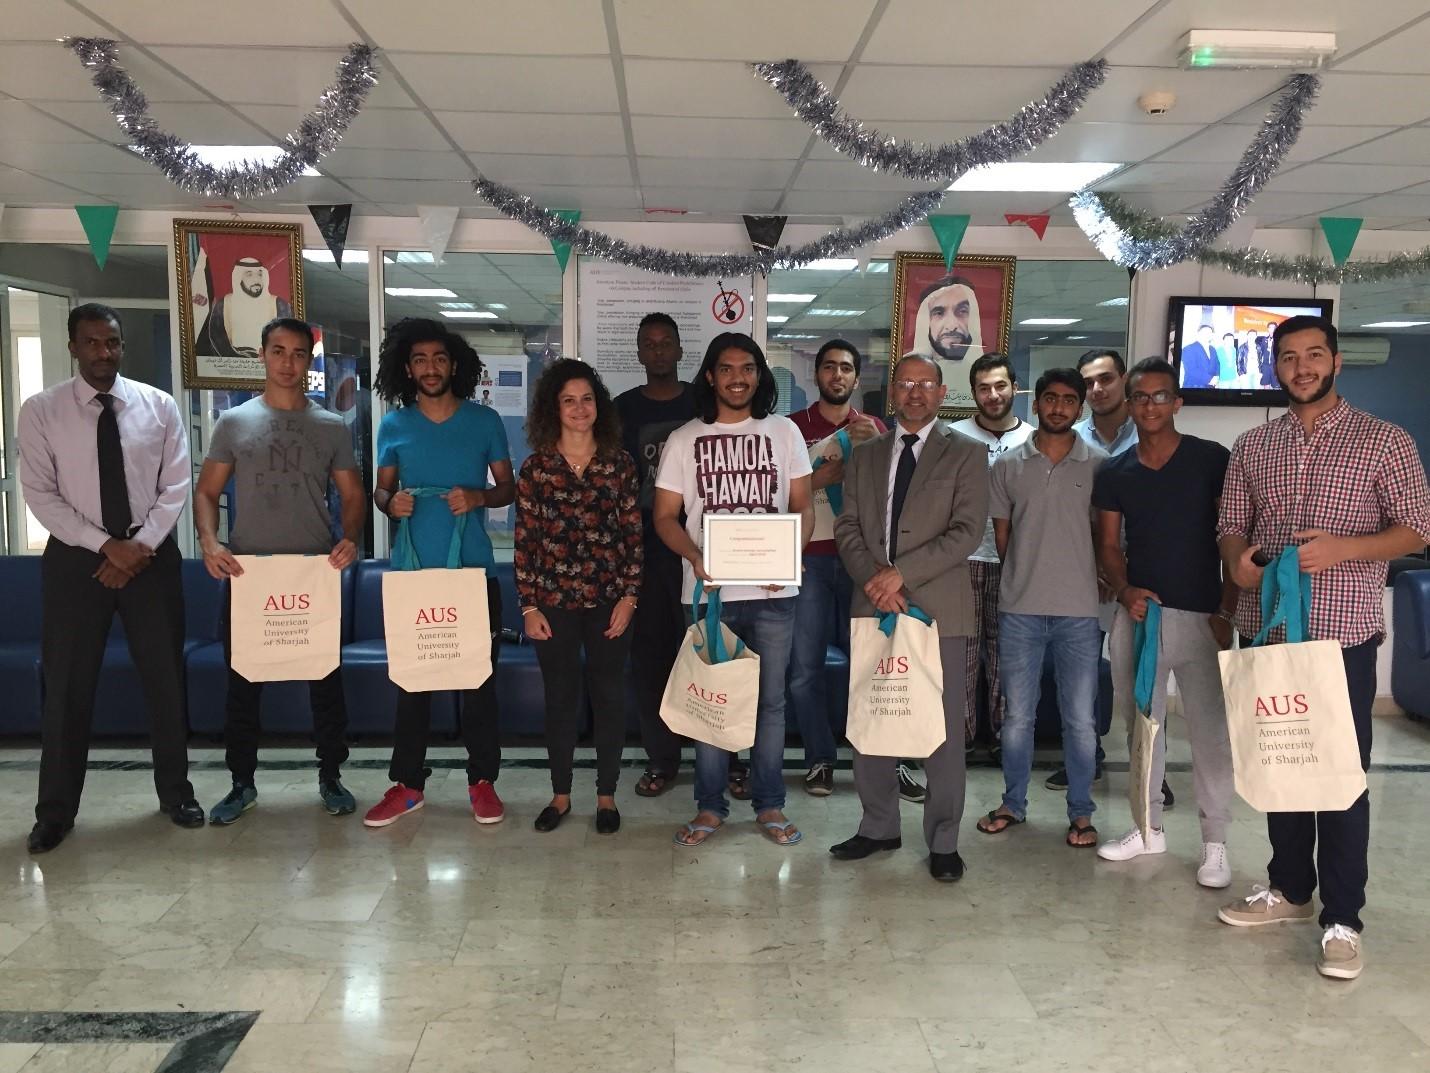 American_University_of_Sharjah_Evergy_Saving_Competition_2.jpg